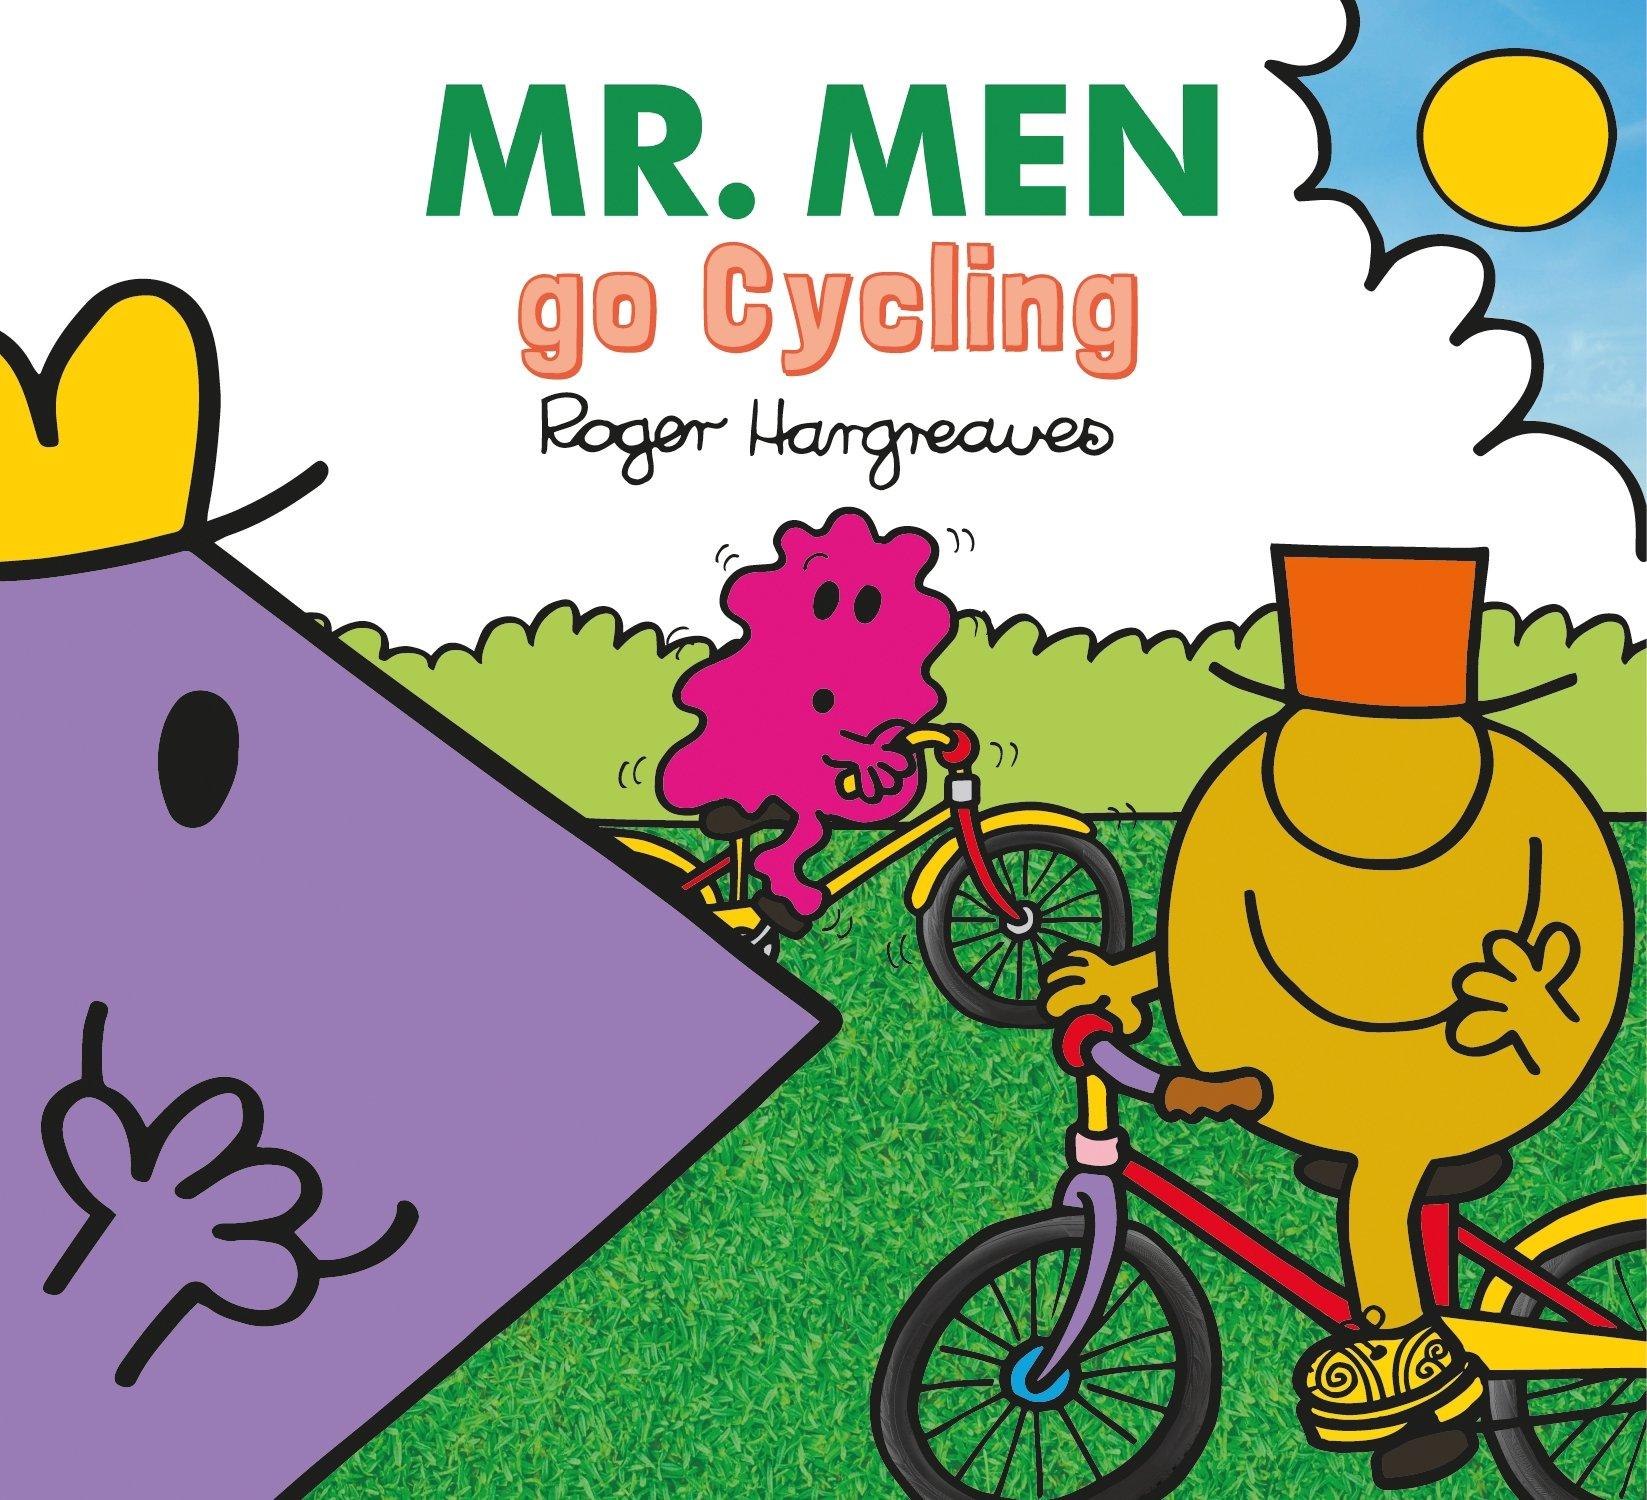 Mr. Men go Cycling